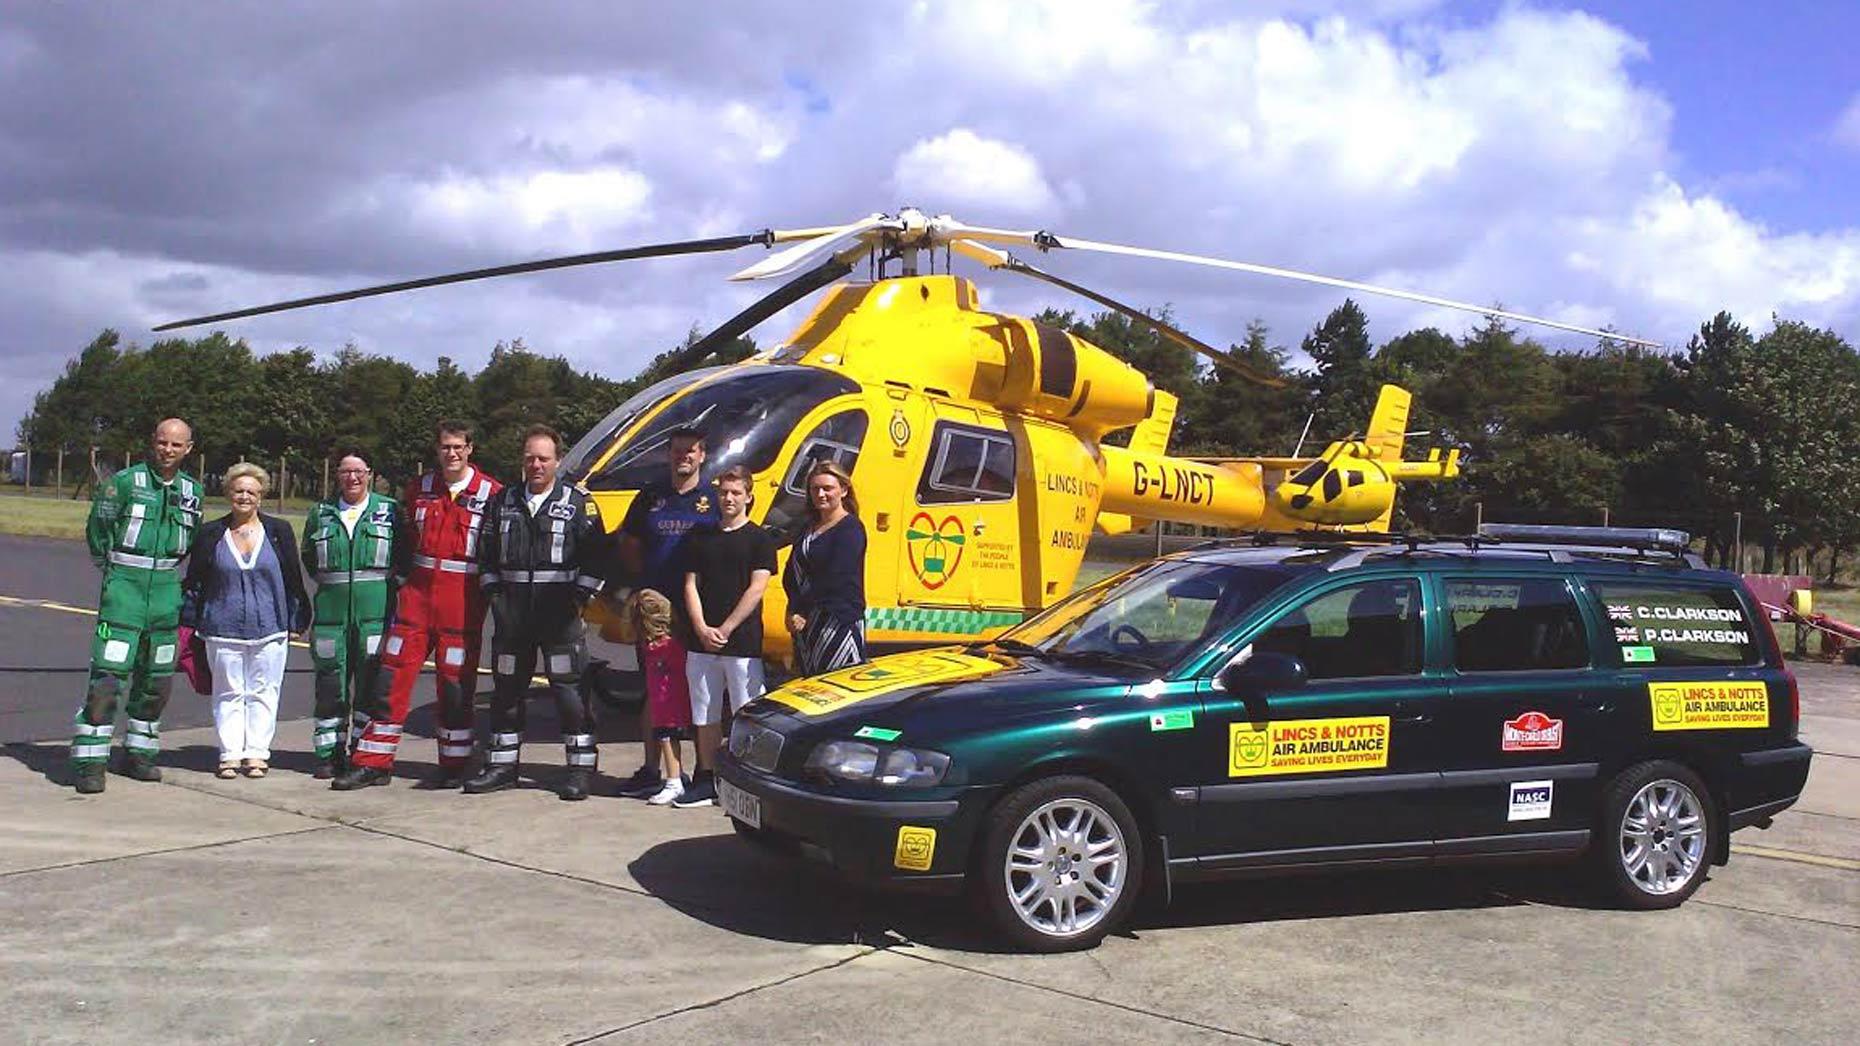 Clarkson family with LNAA crew